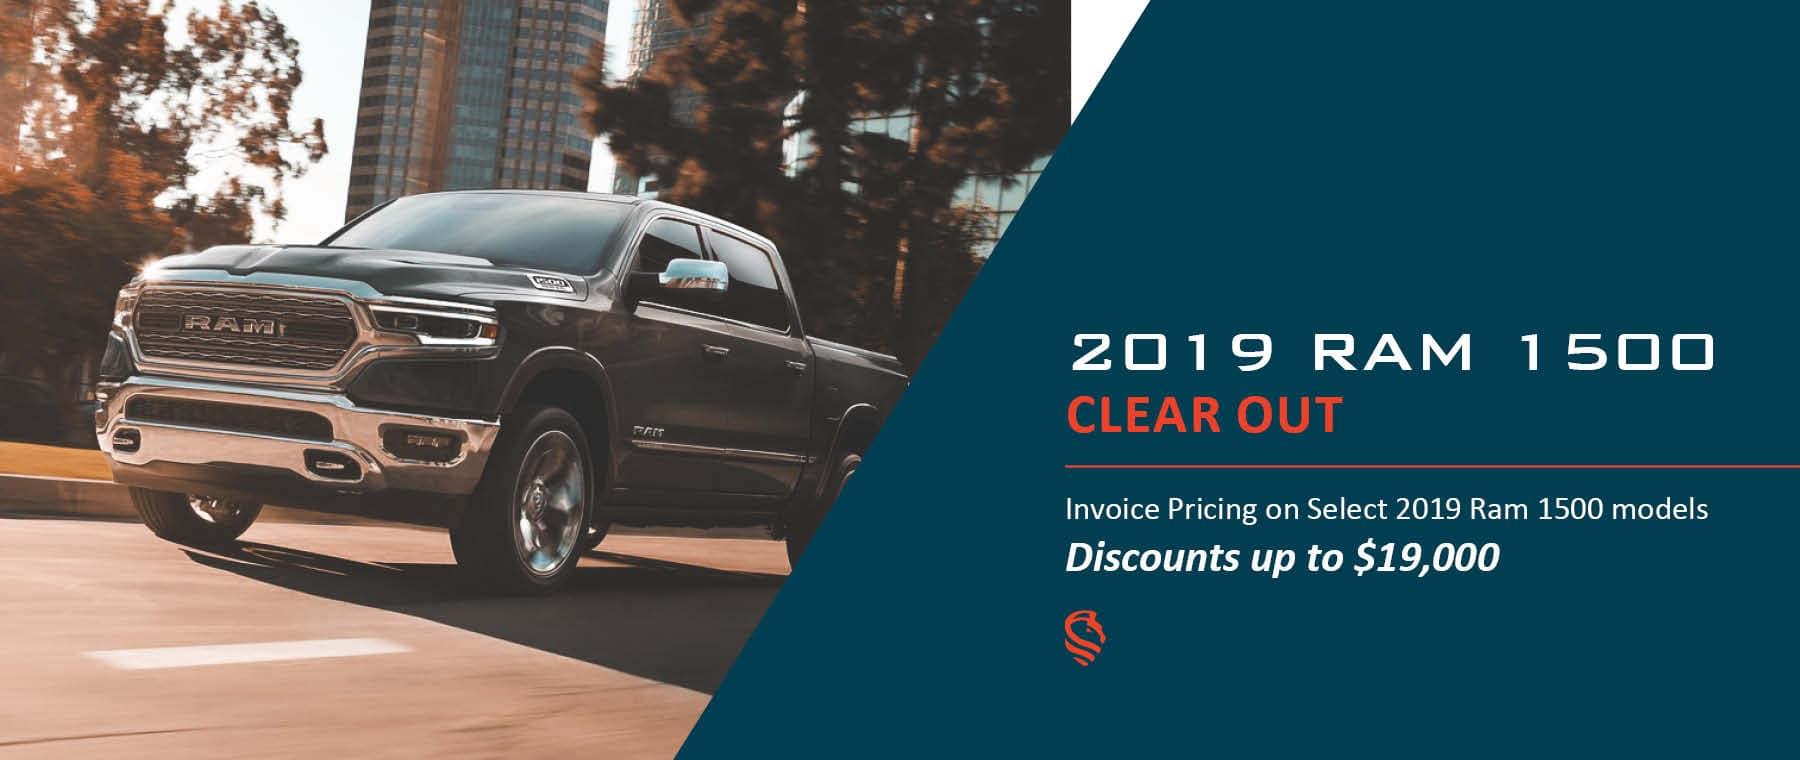 2019 Ram 1500 Invoice Pricing